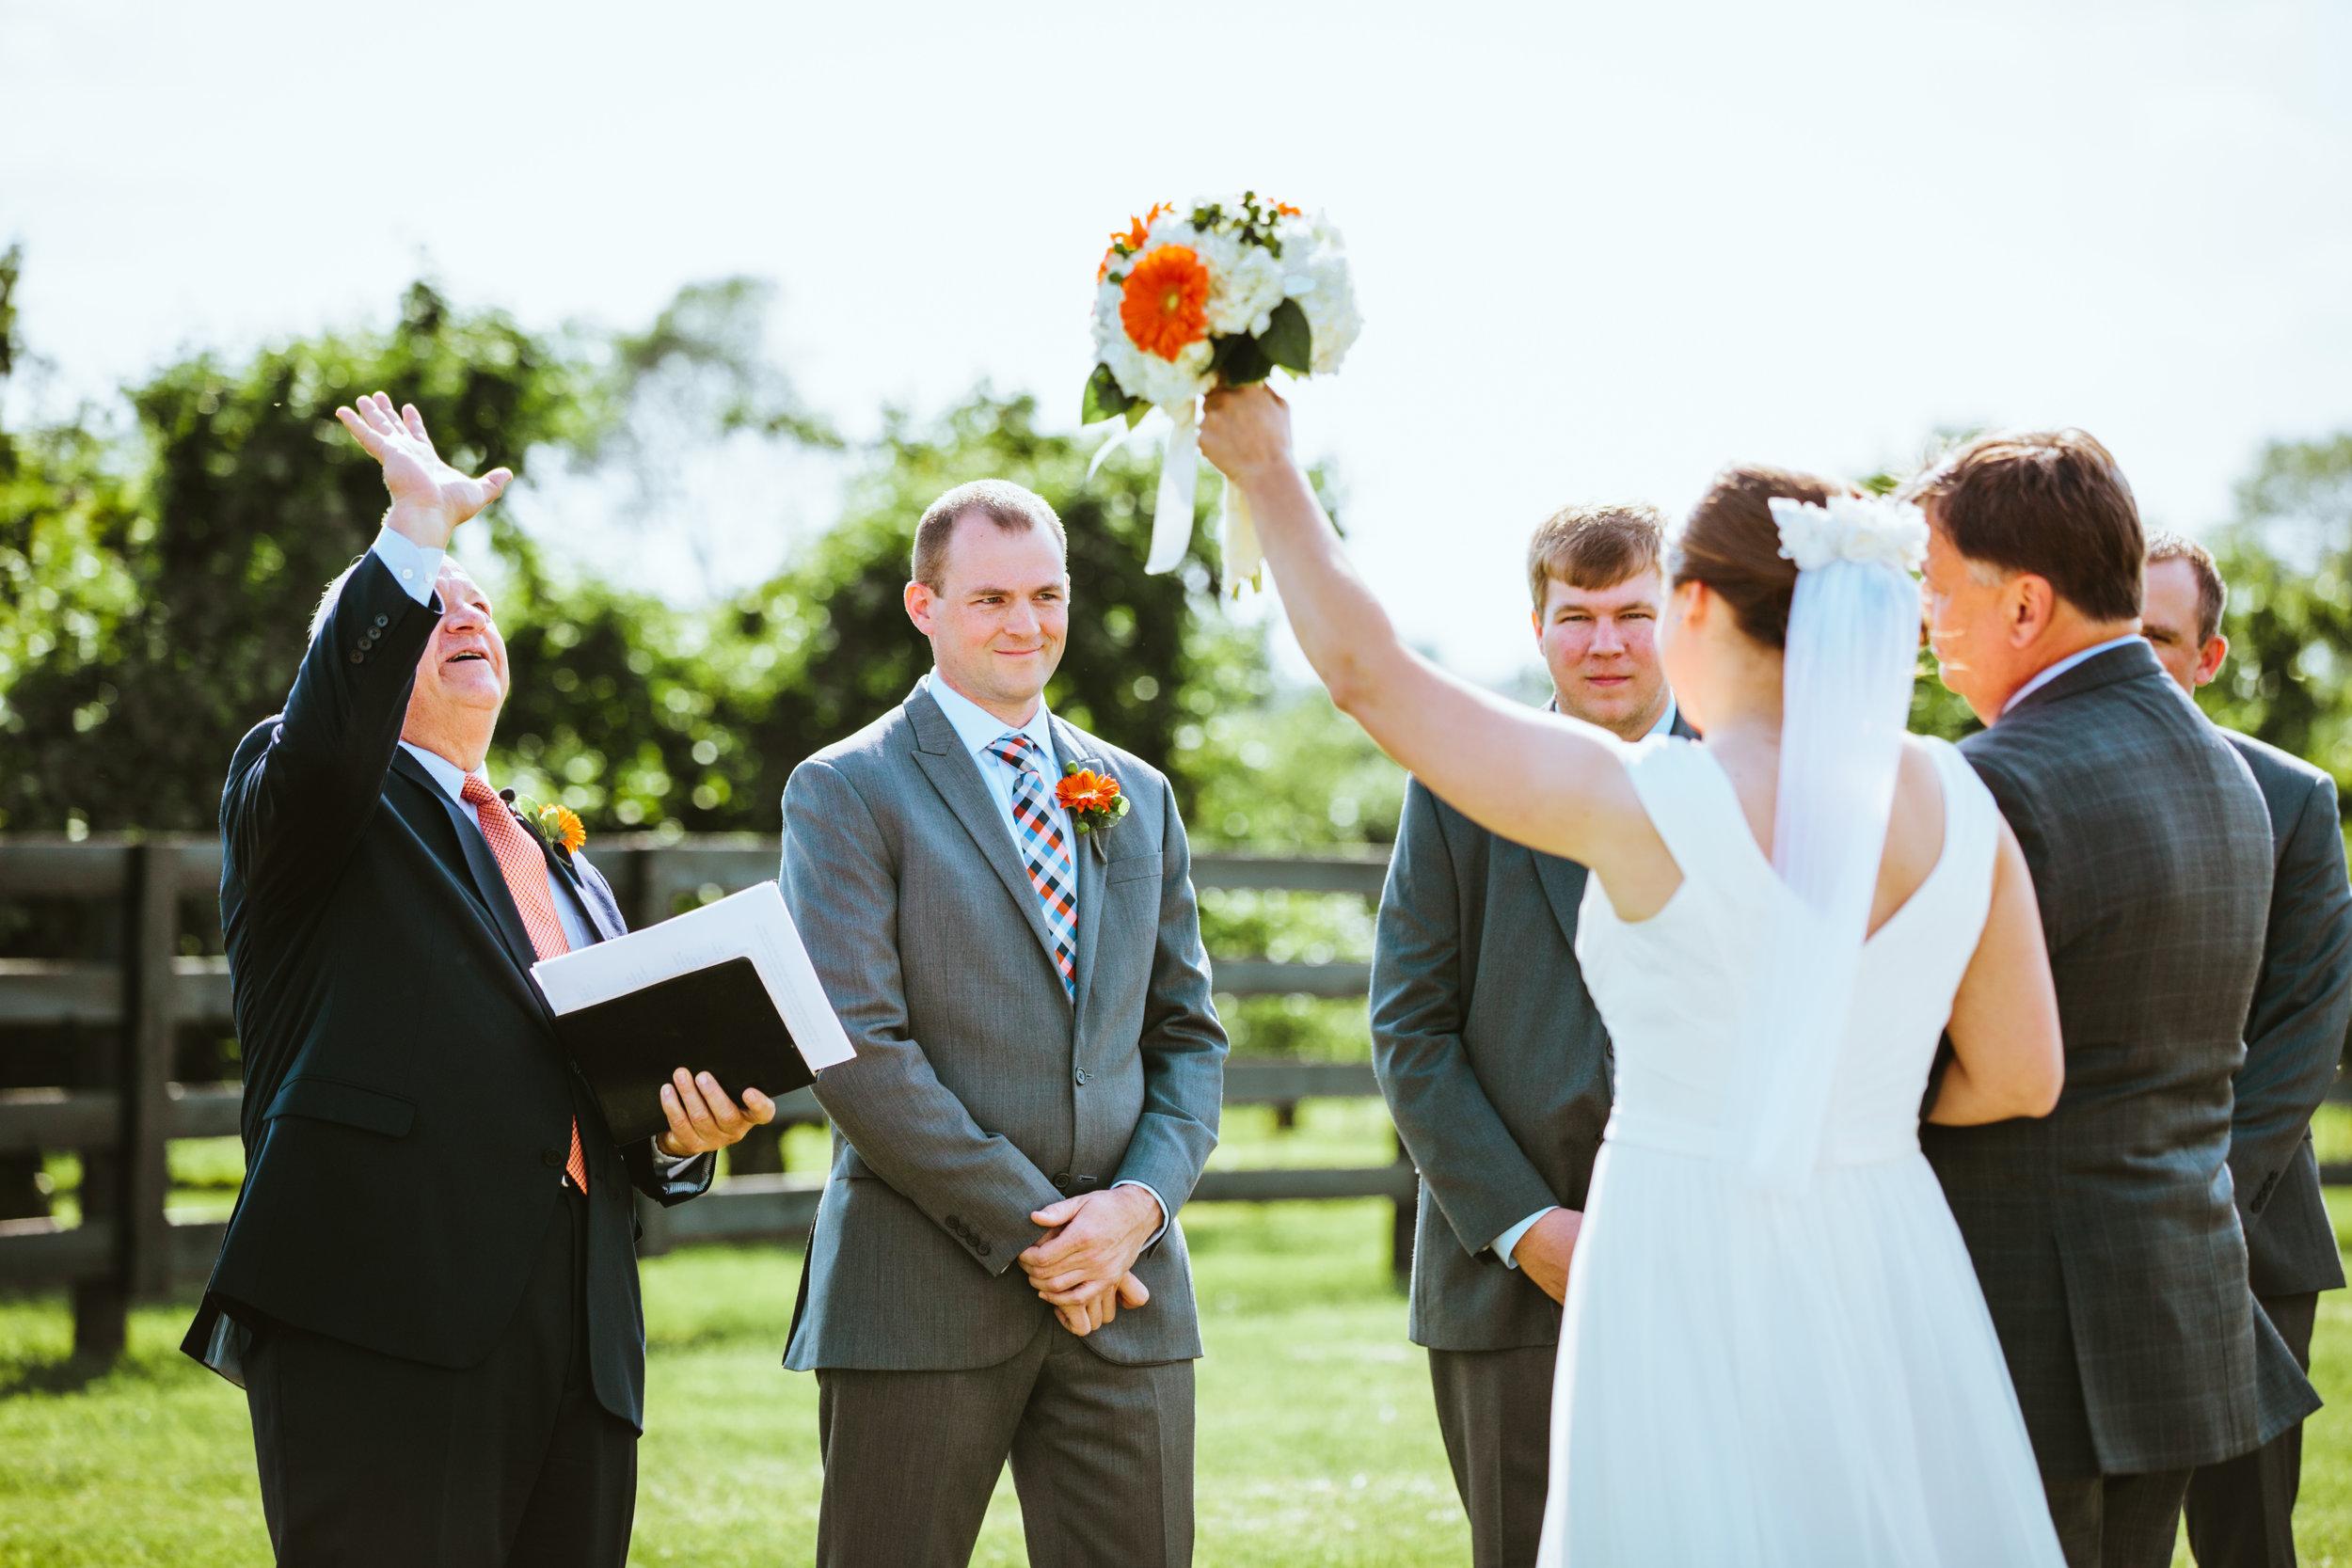 Whitesell-Mattioda Wedding-580.jpg